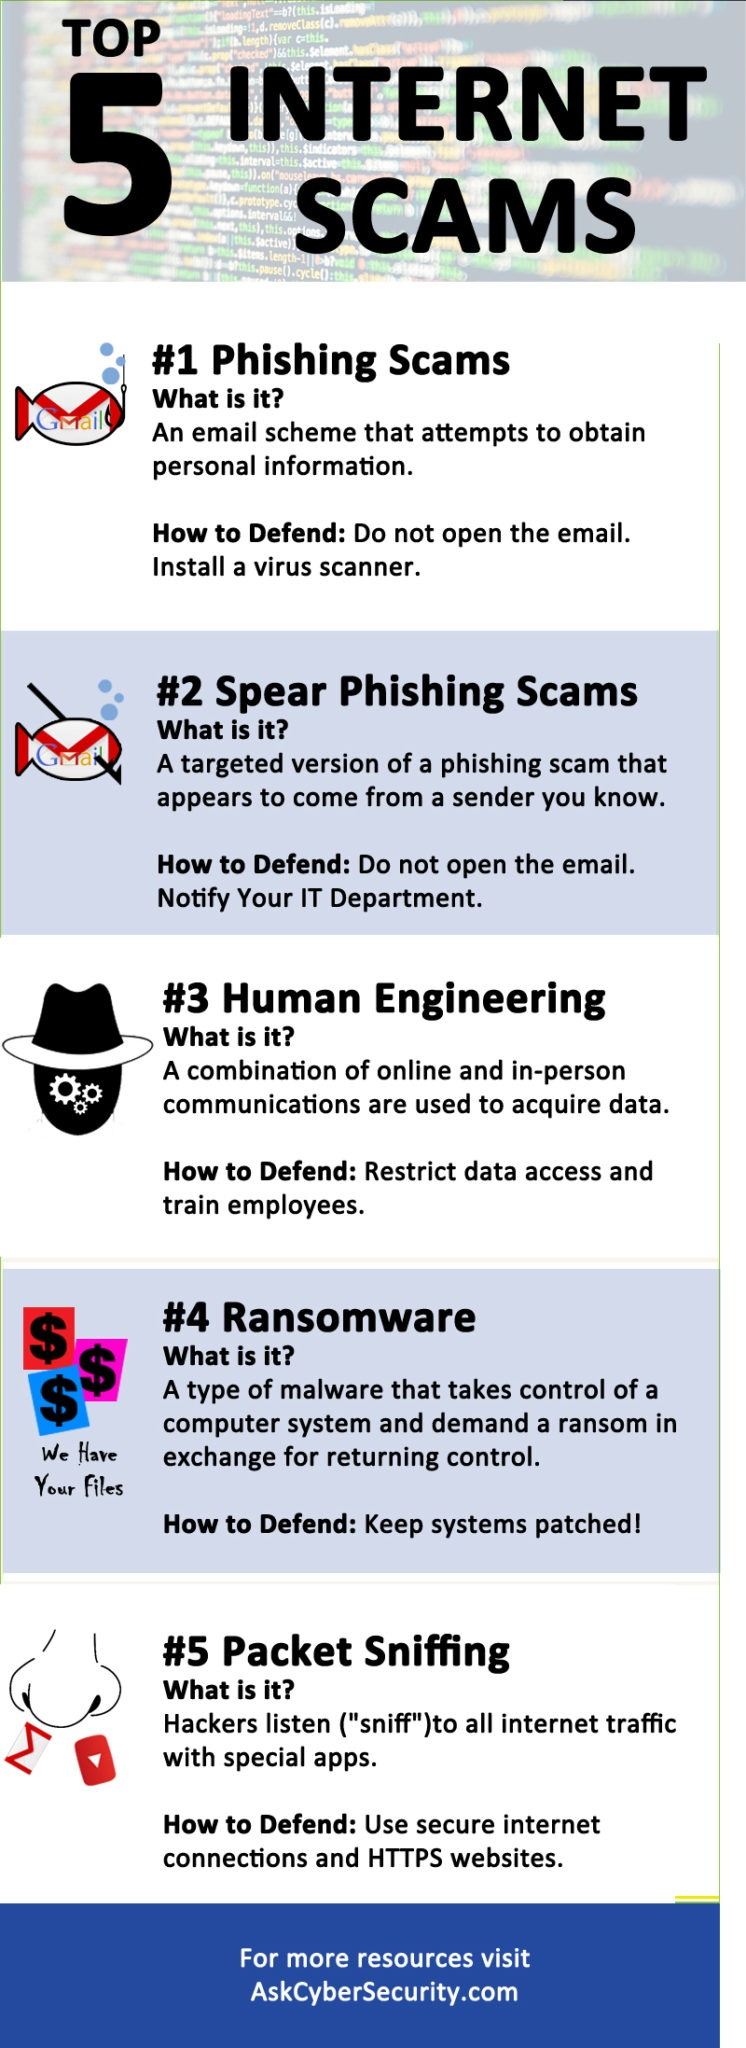 Five Top Internet Scams